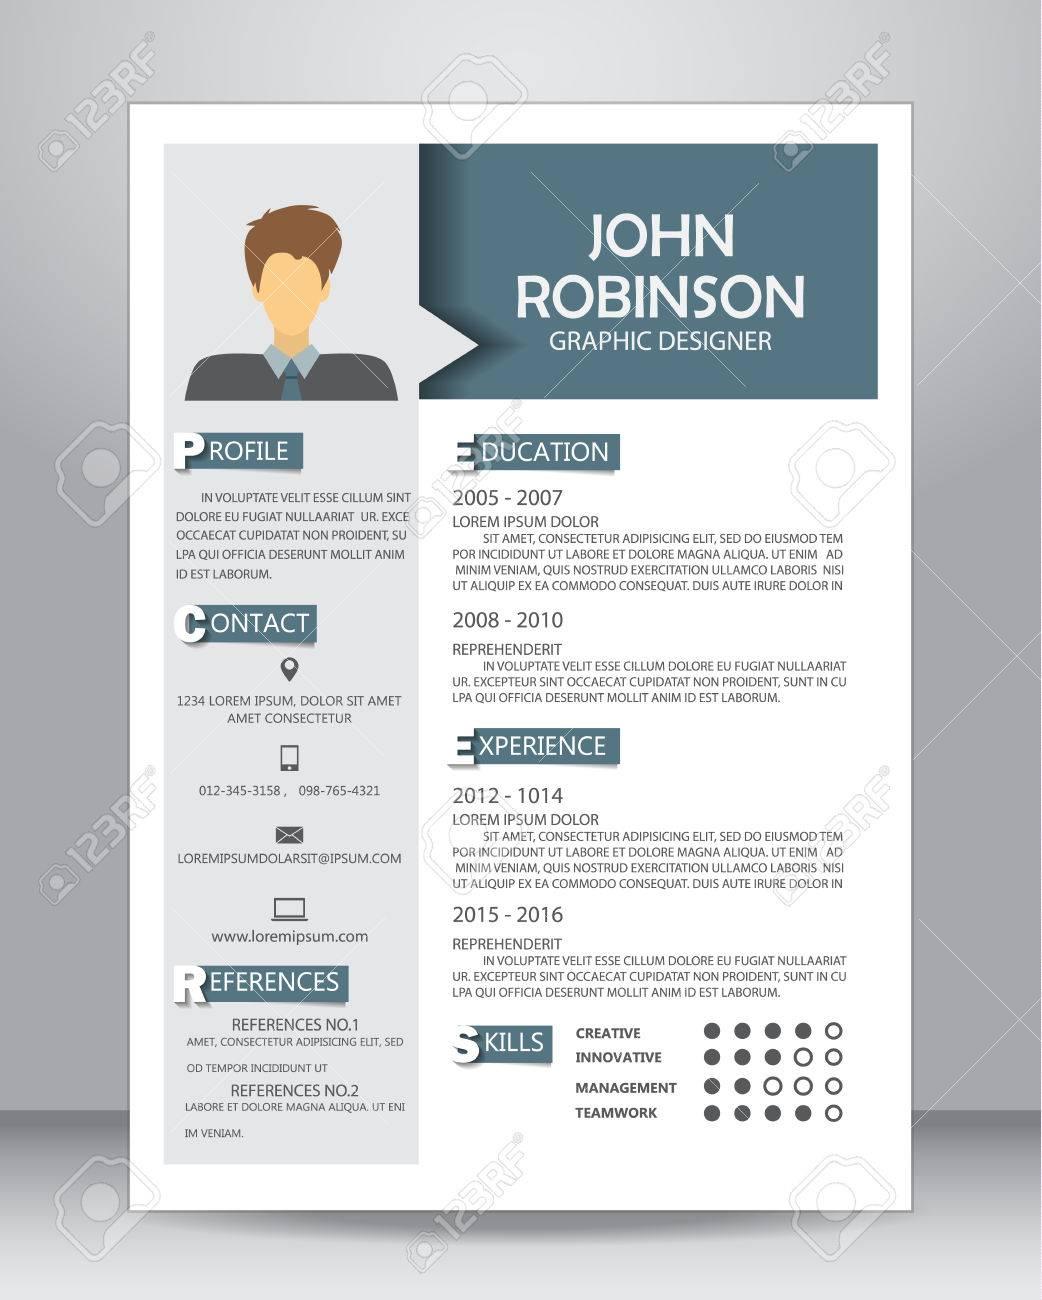 job lebenslauf oder lebenslauf layout in a4 gre vektor illustration standard bild - Lebenslauf Layout